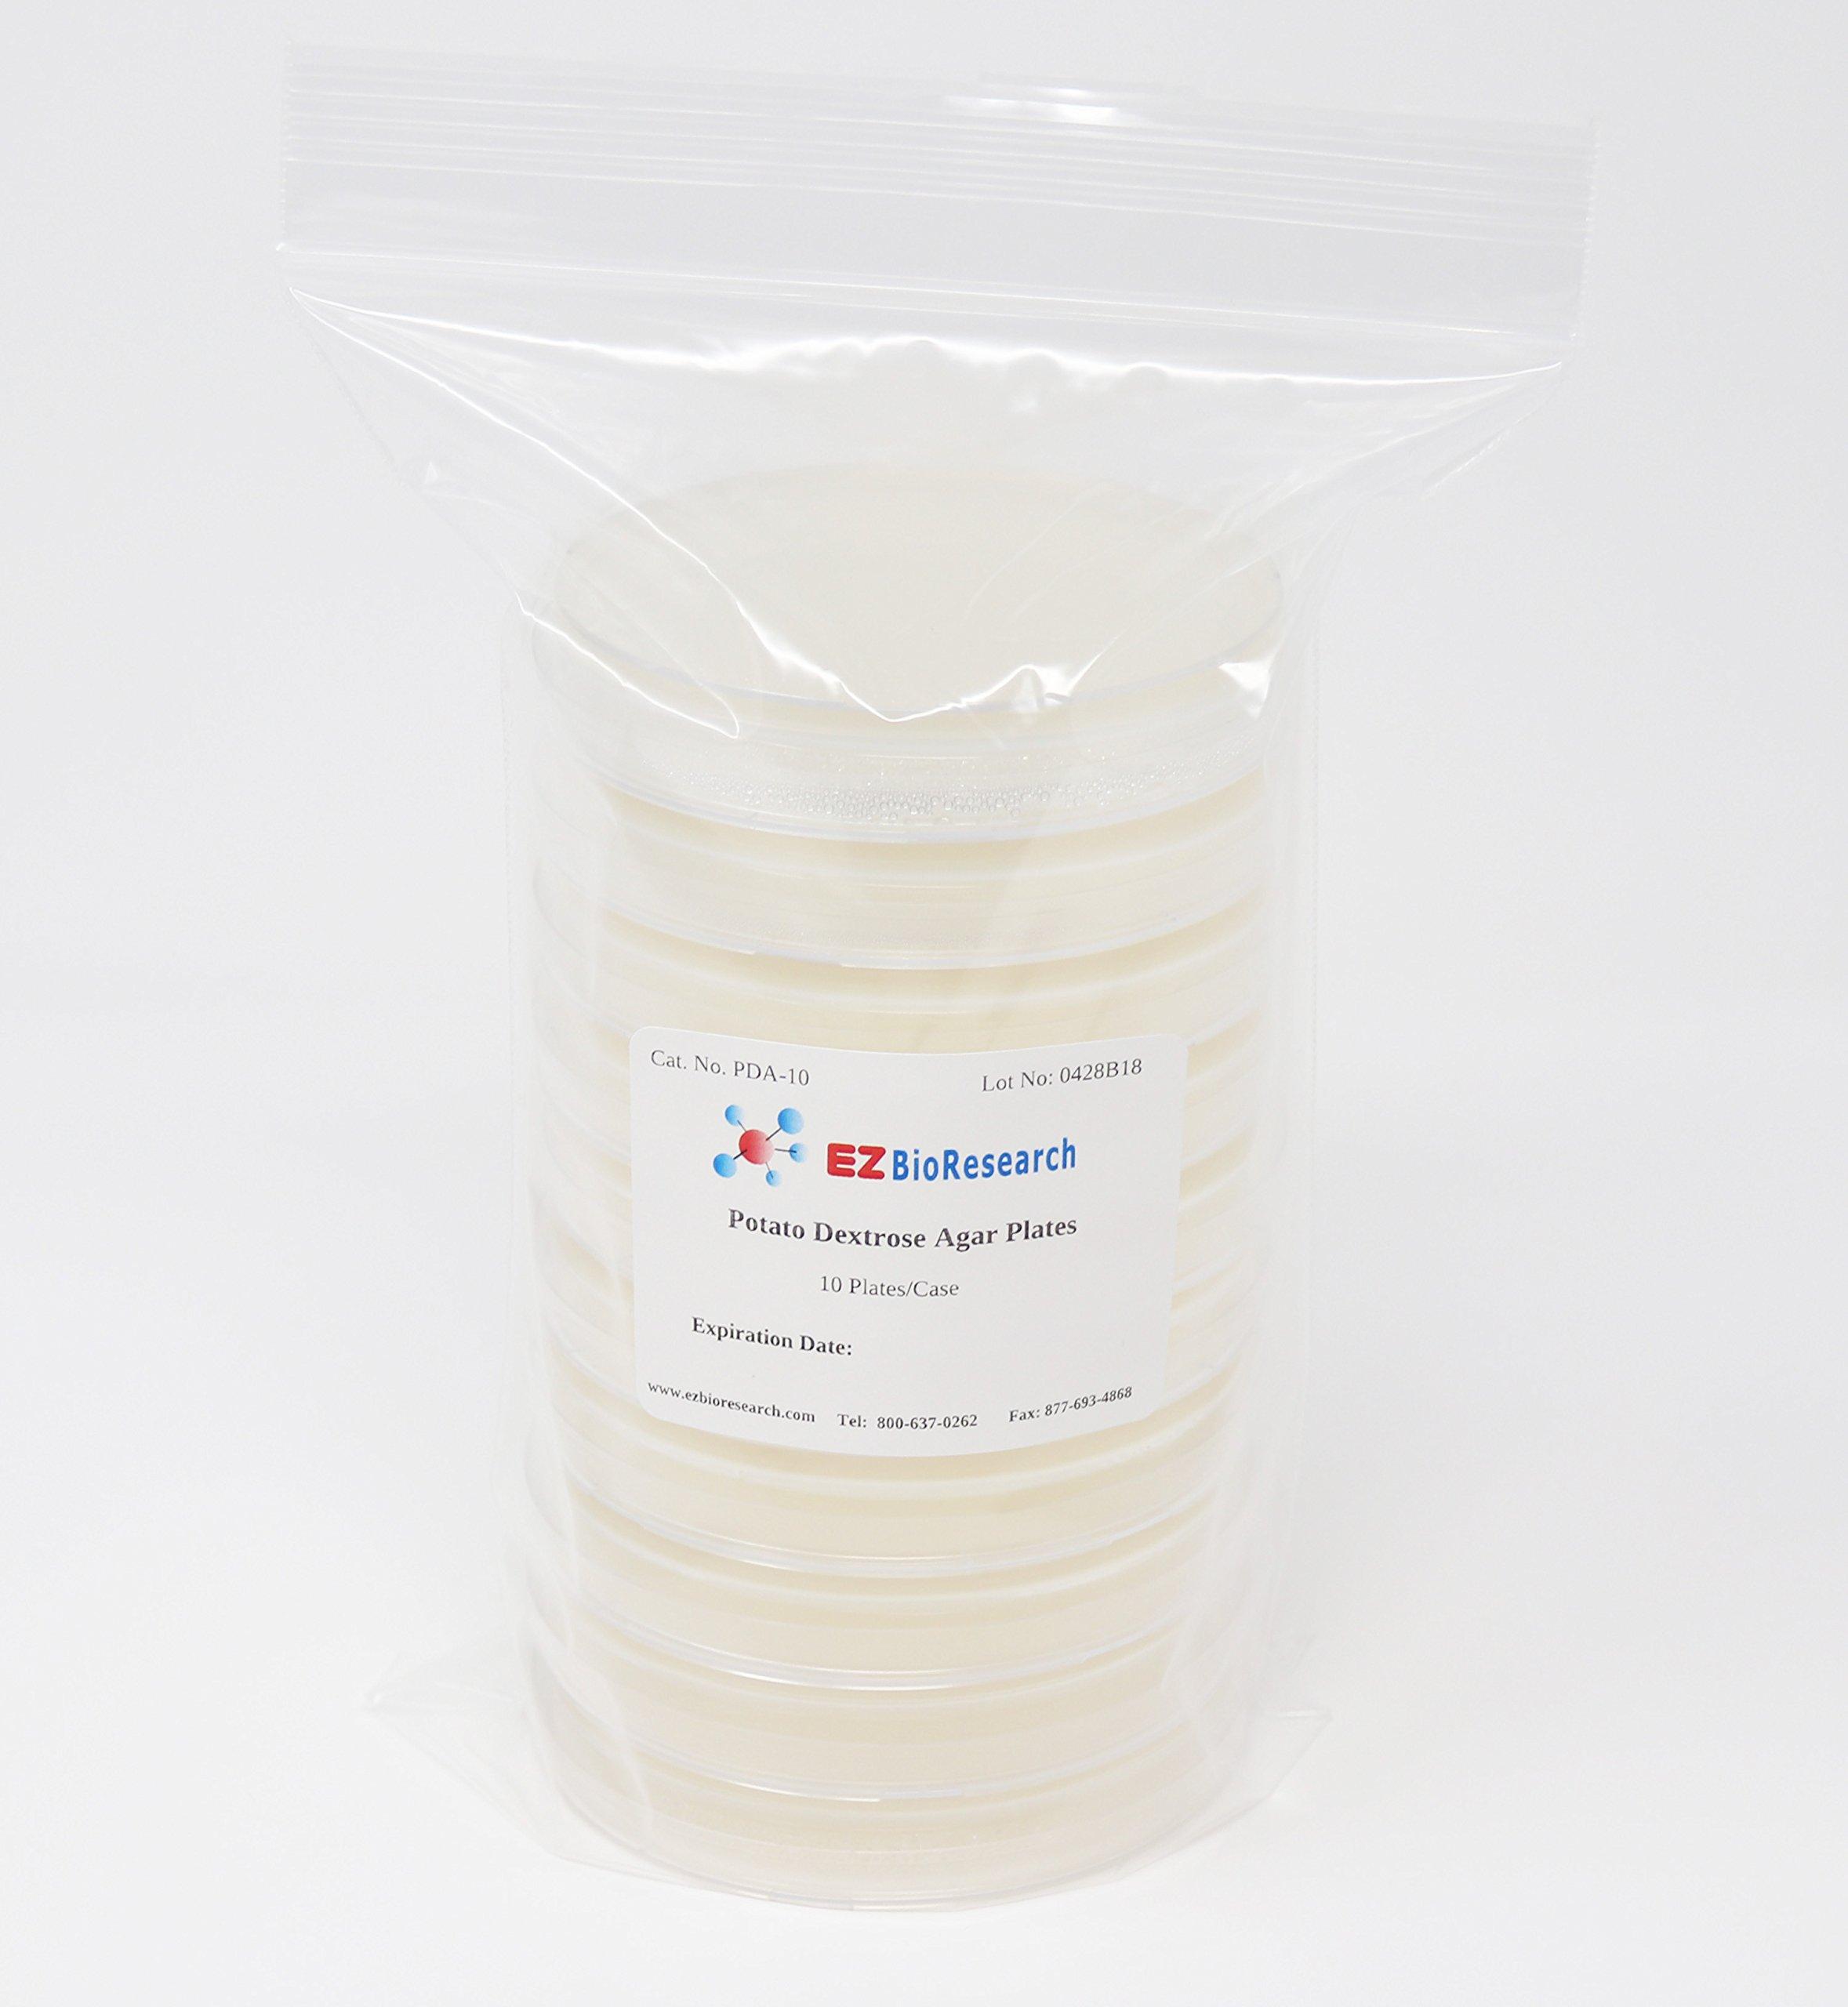 EZ BioResearch Potato Dextrose Agar (PDA) Plates for Mushroom Cultivation (10 Prepoured Agar Plates) by EZ BioResearch